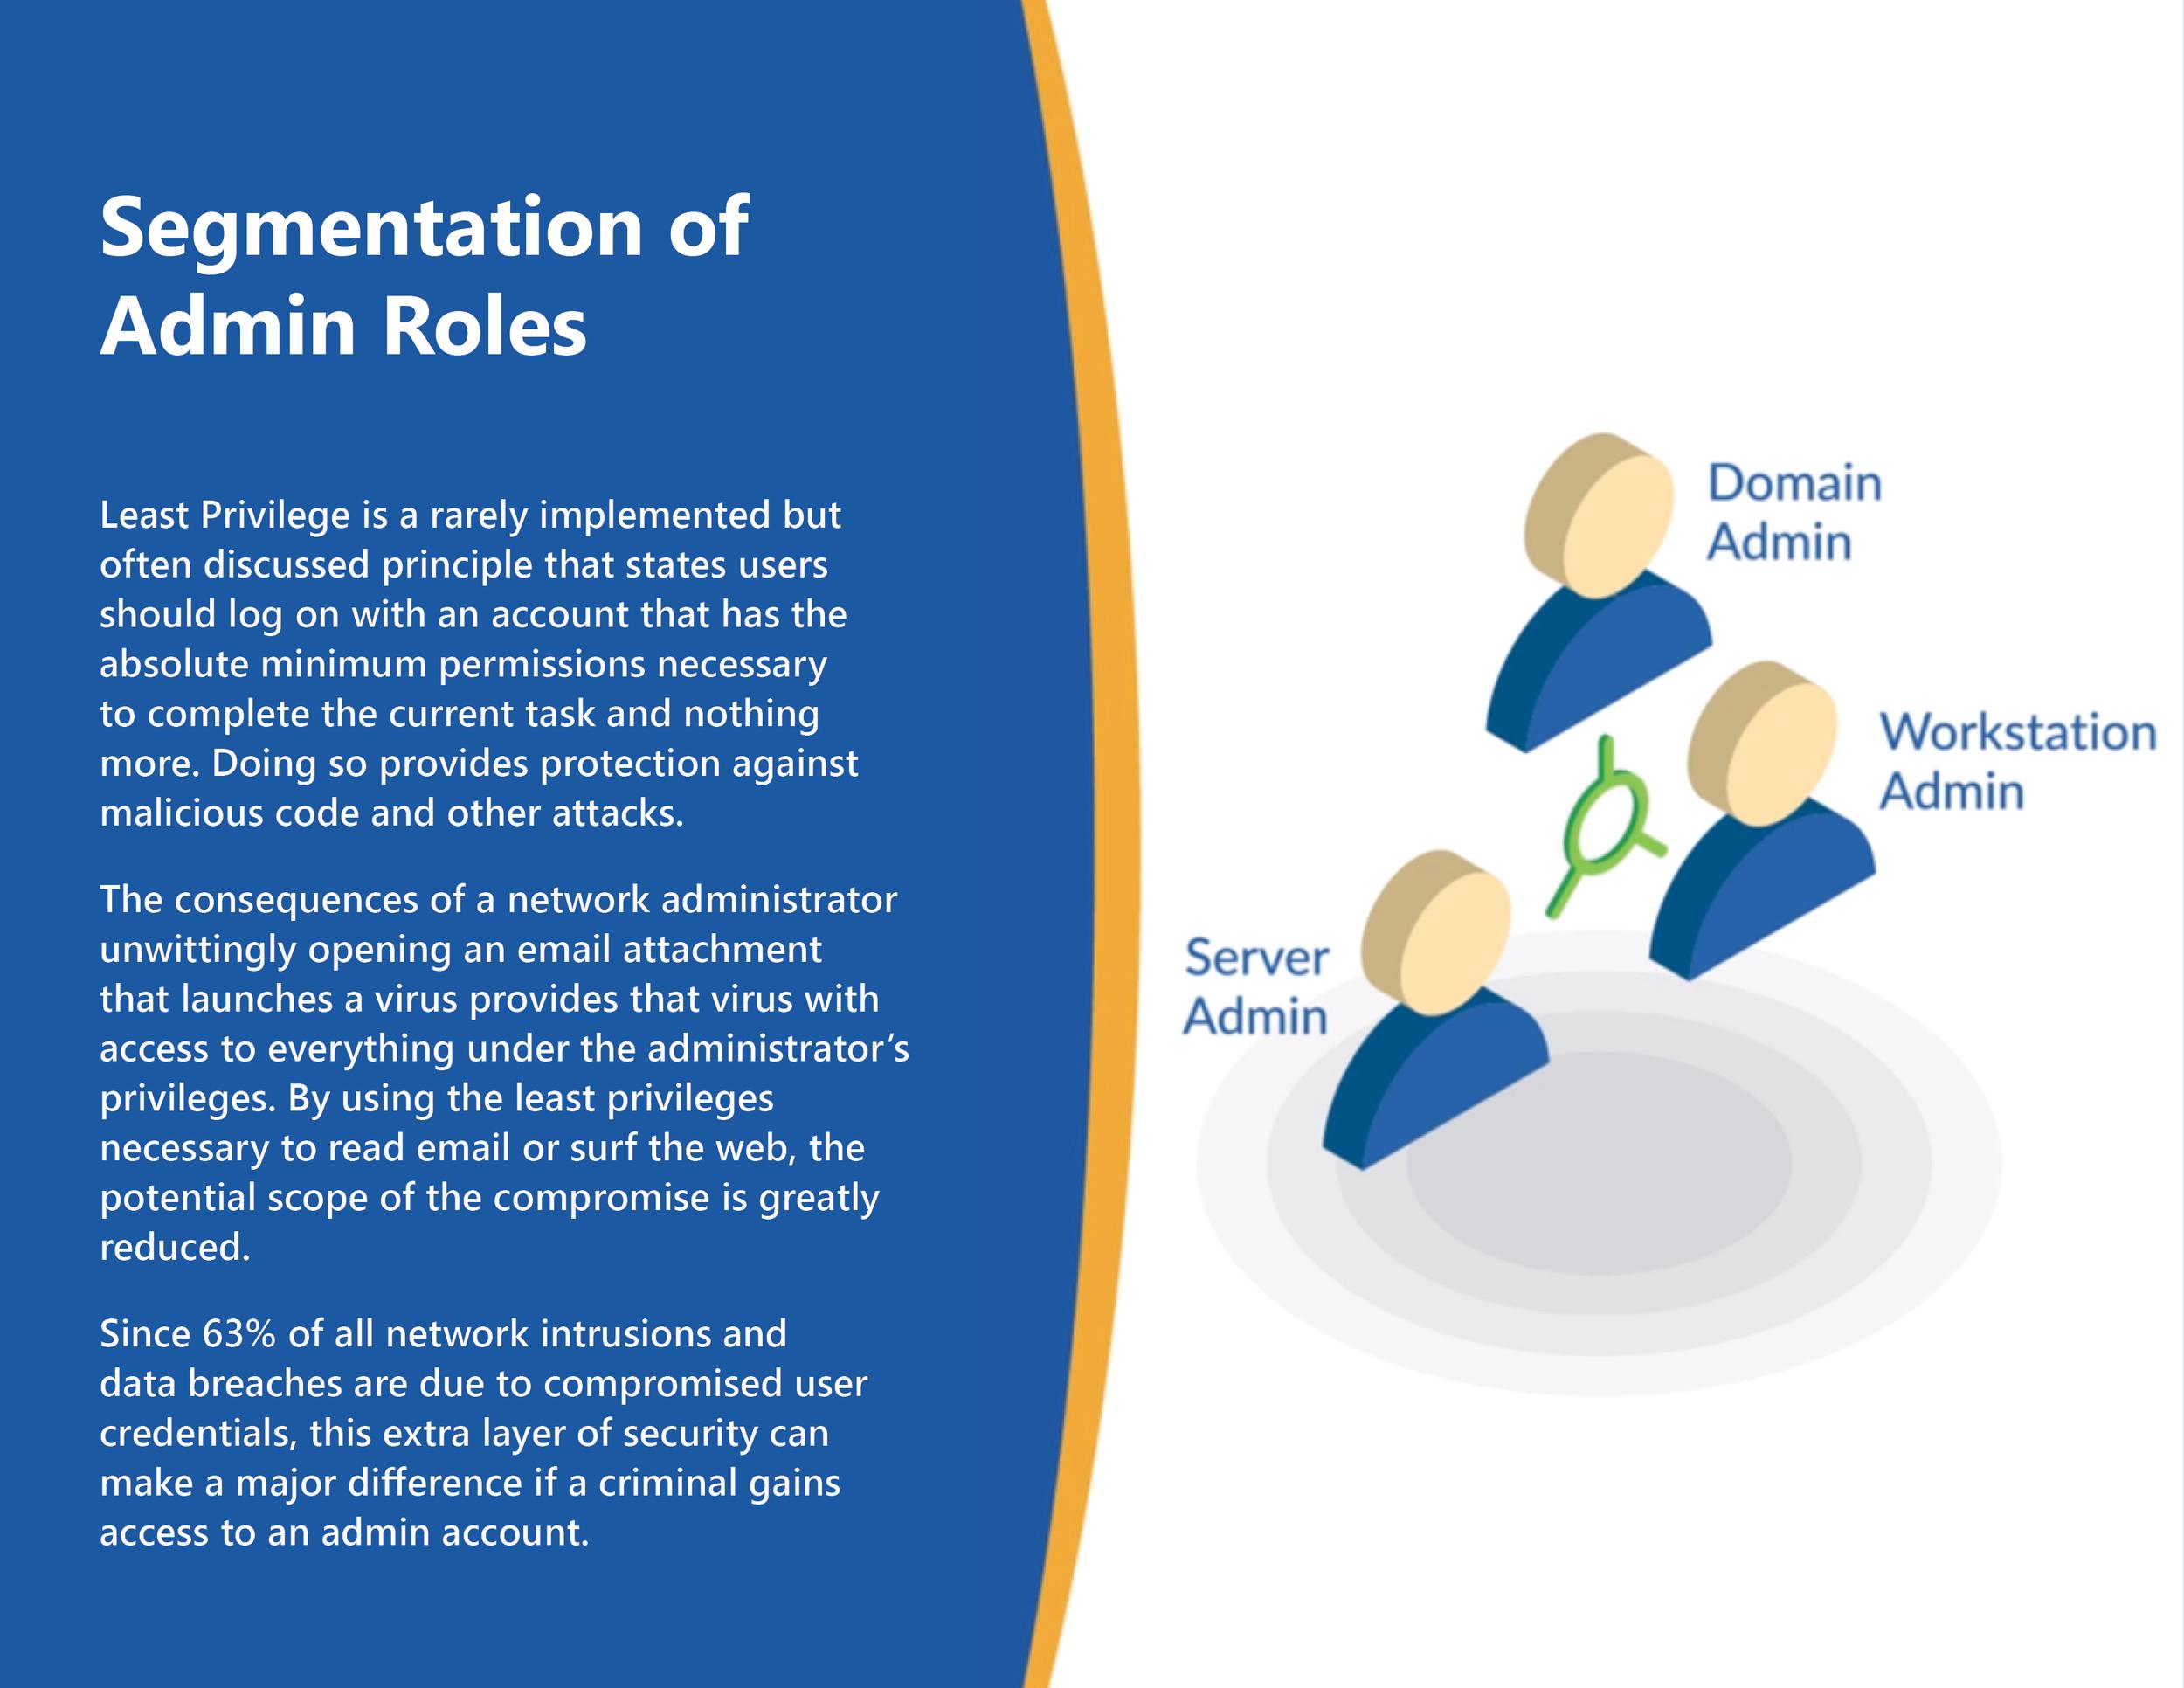 Segmentation of Admin Roles